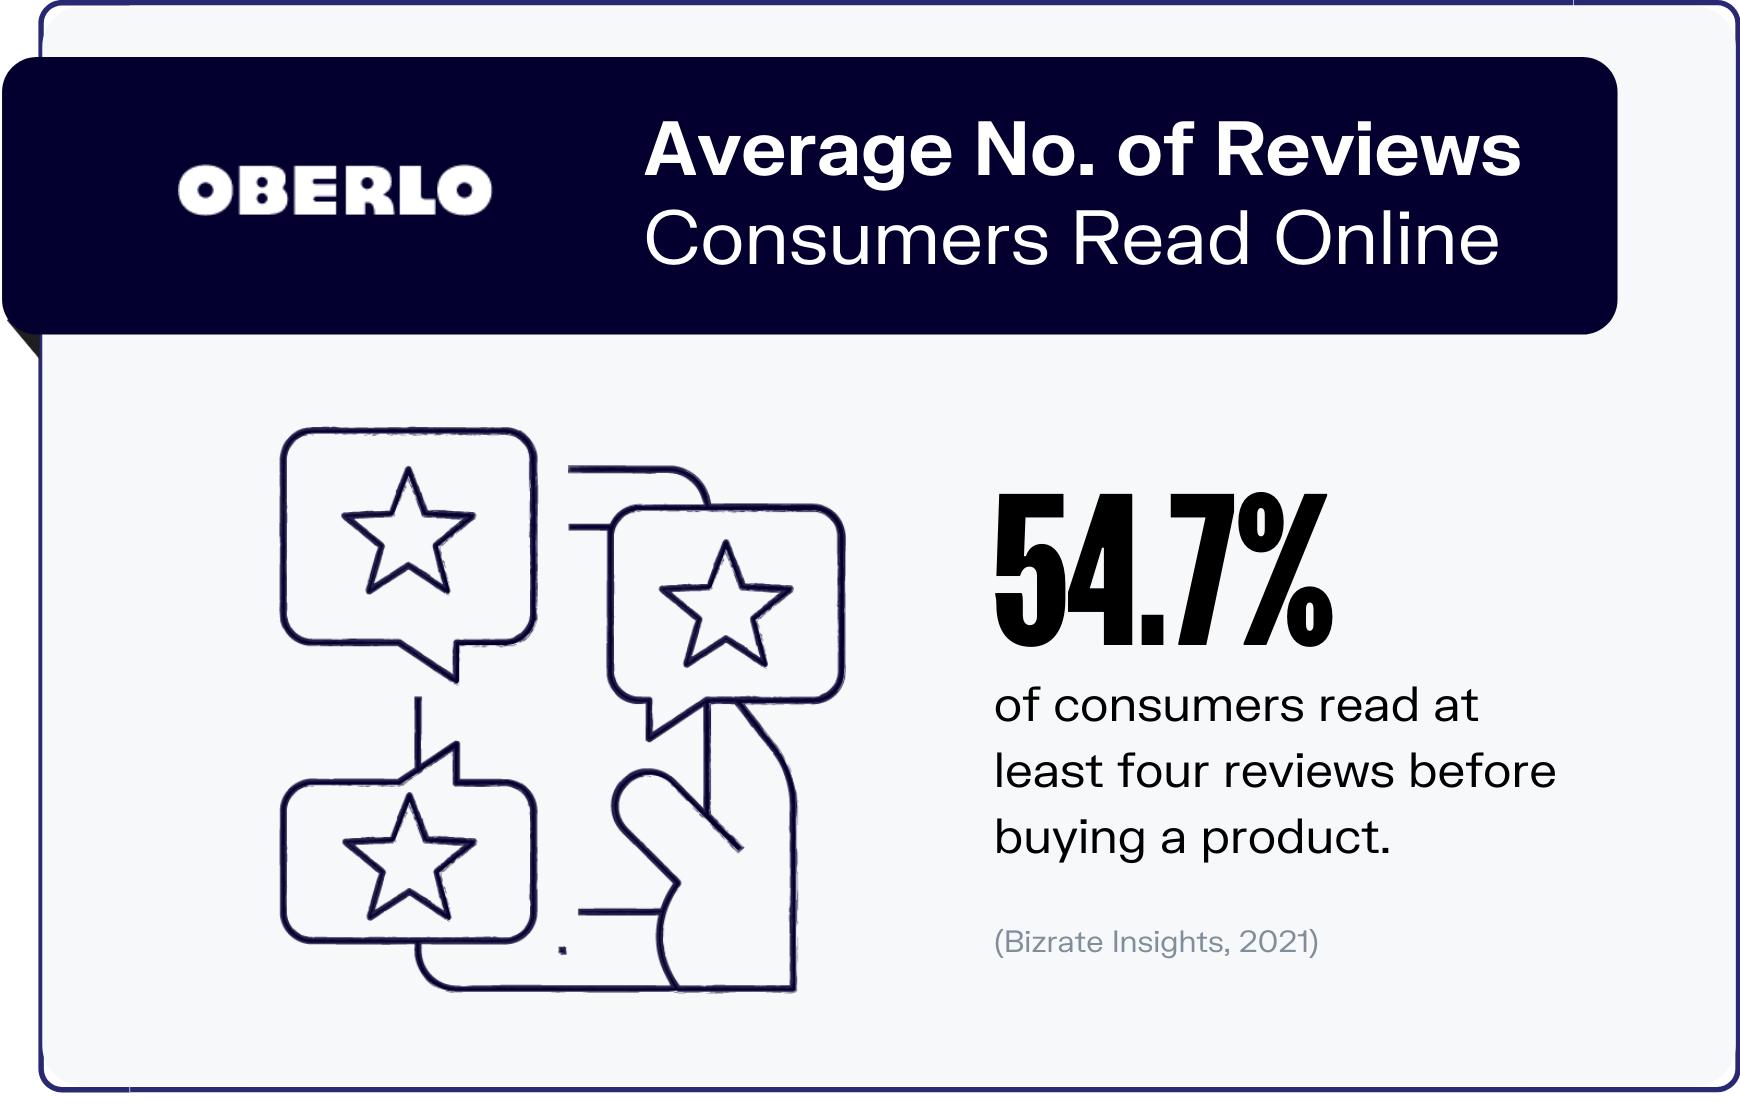 online reviews statistics graphic 5